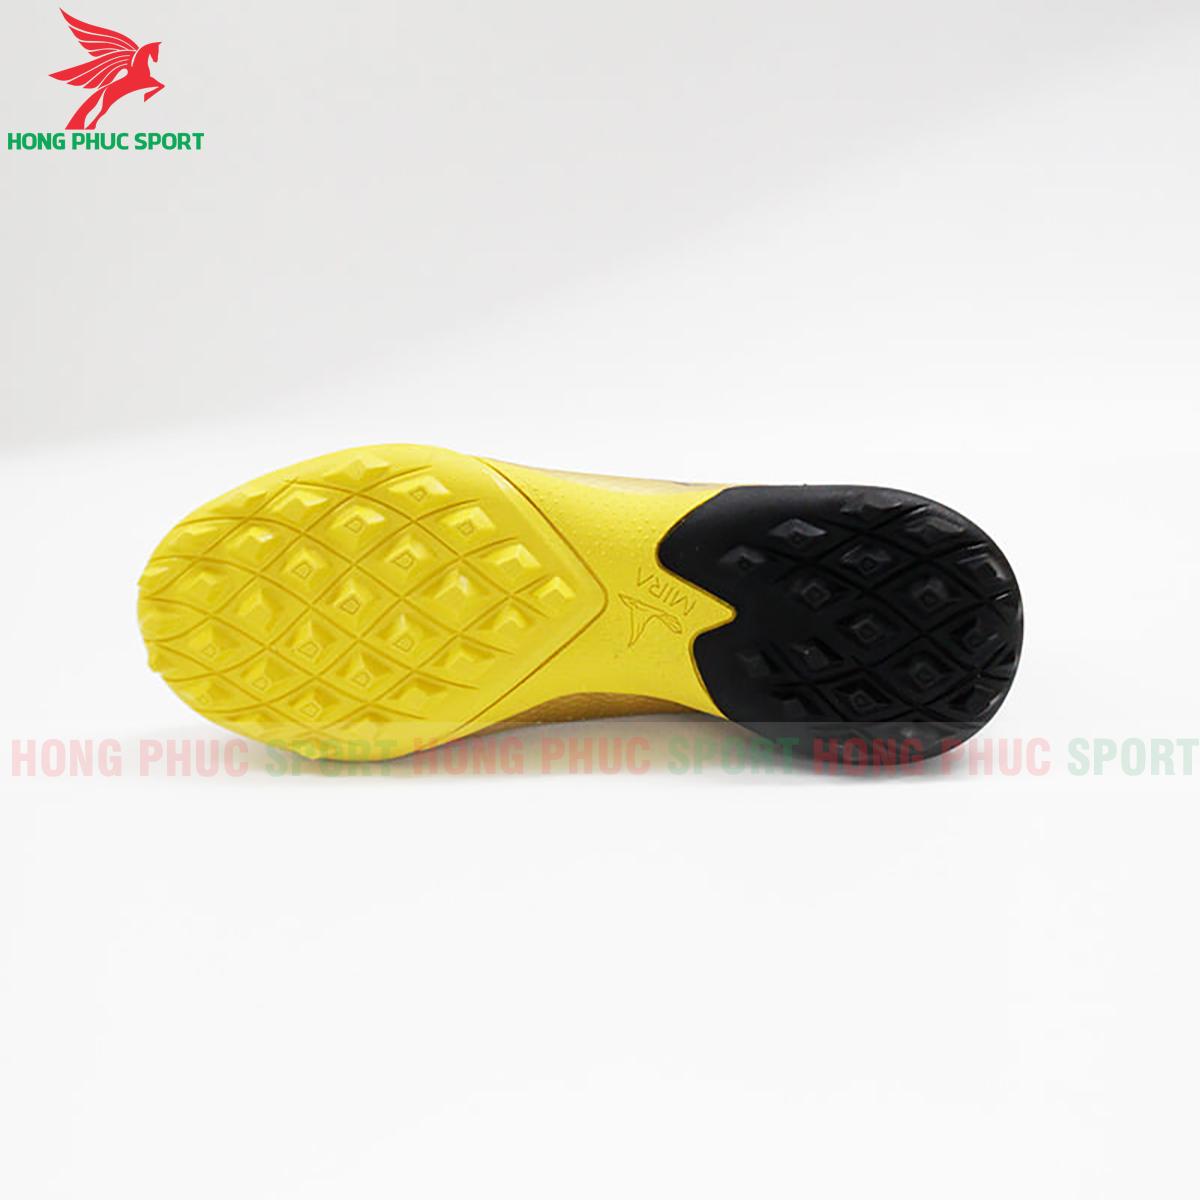 https://cdn.hongphucsport.com/unsafe/s4.shopbay.vn/files/285/giay-da-bong-mira-lux-20-3-mau-vang-phoi-den-7-5f74018cc2bf1.png